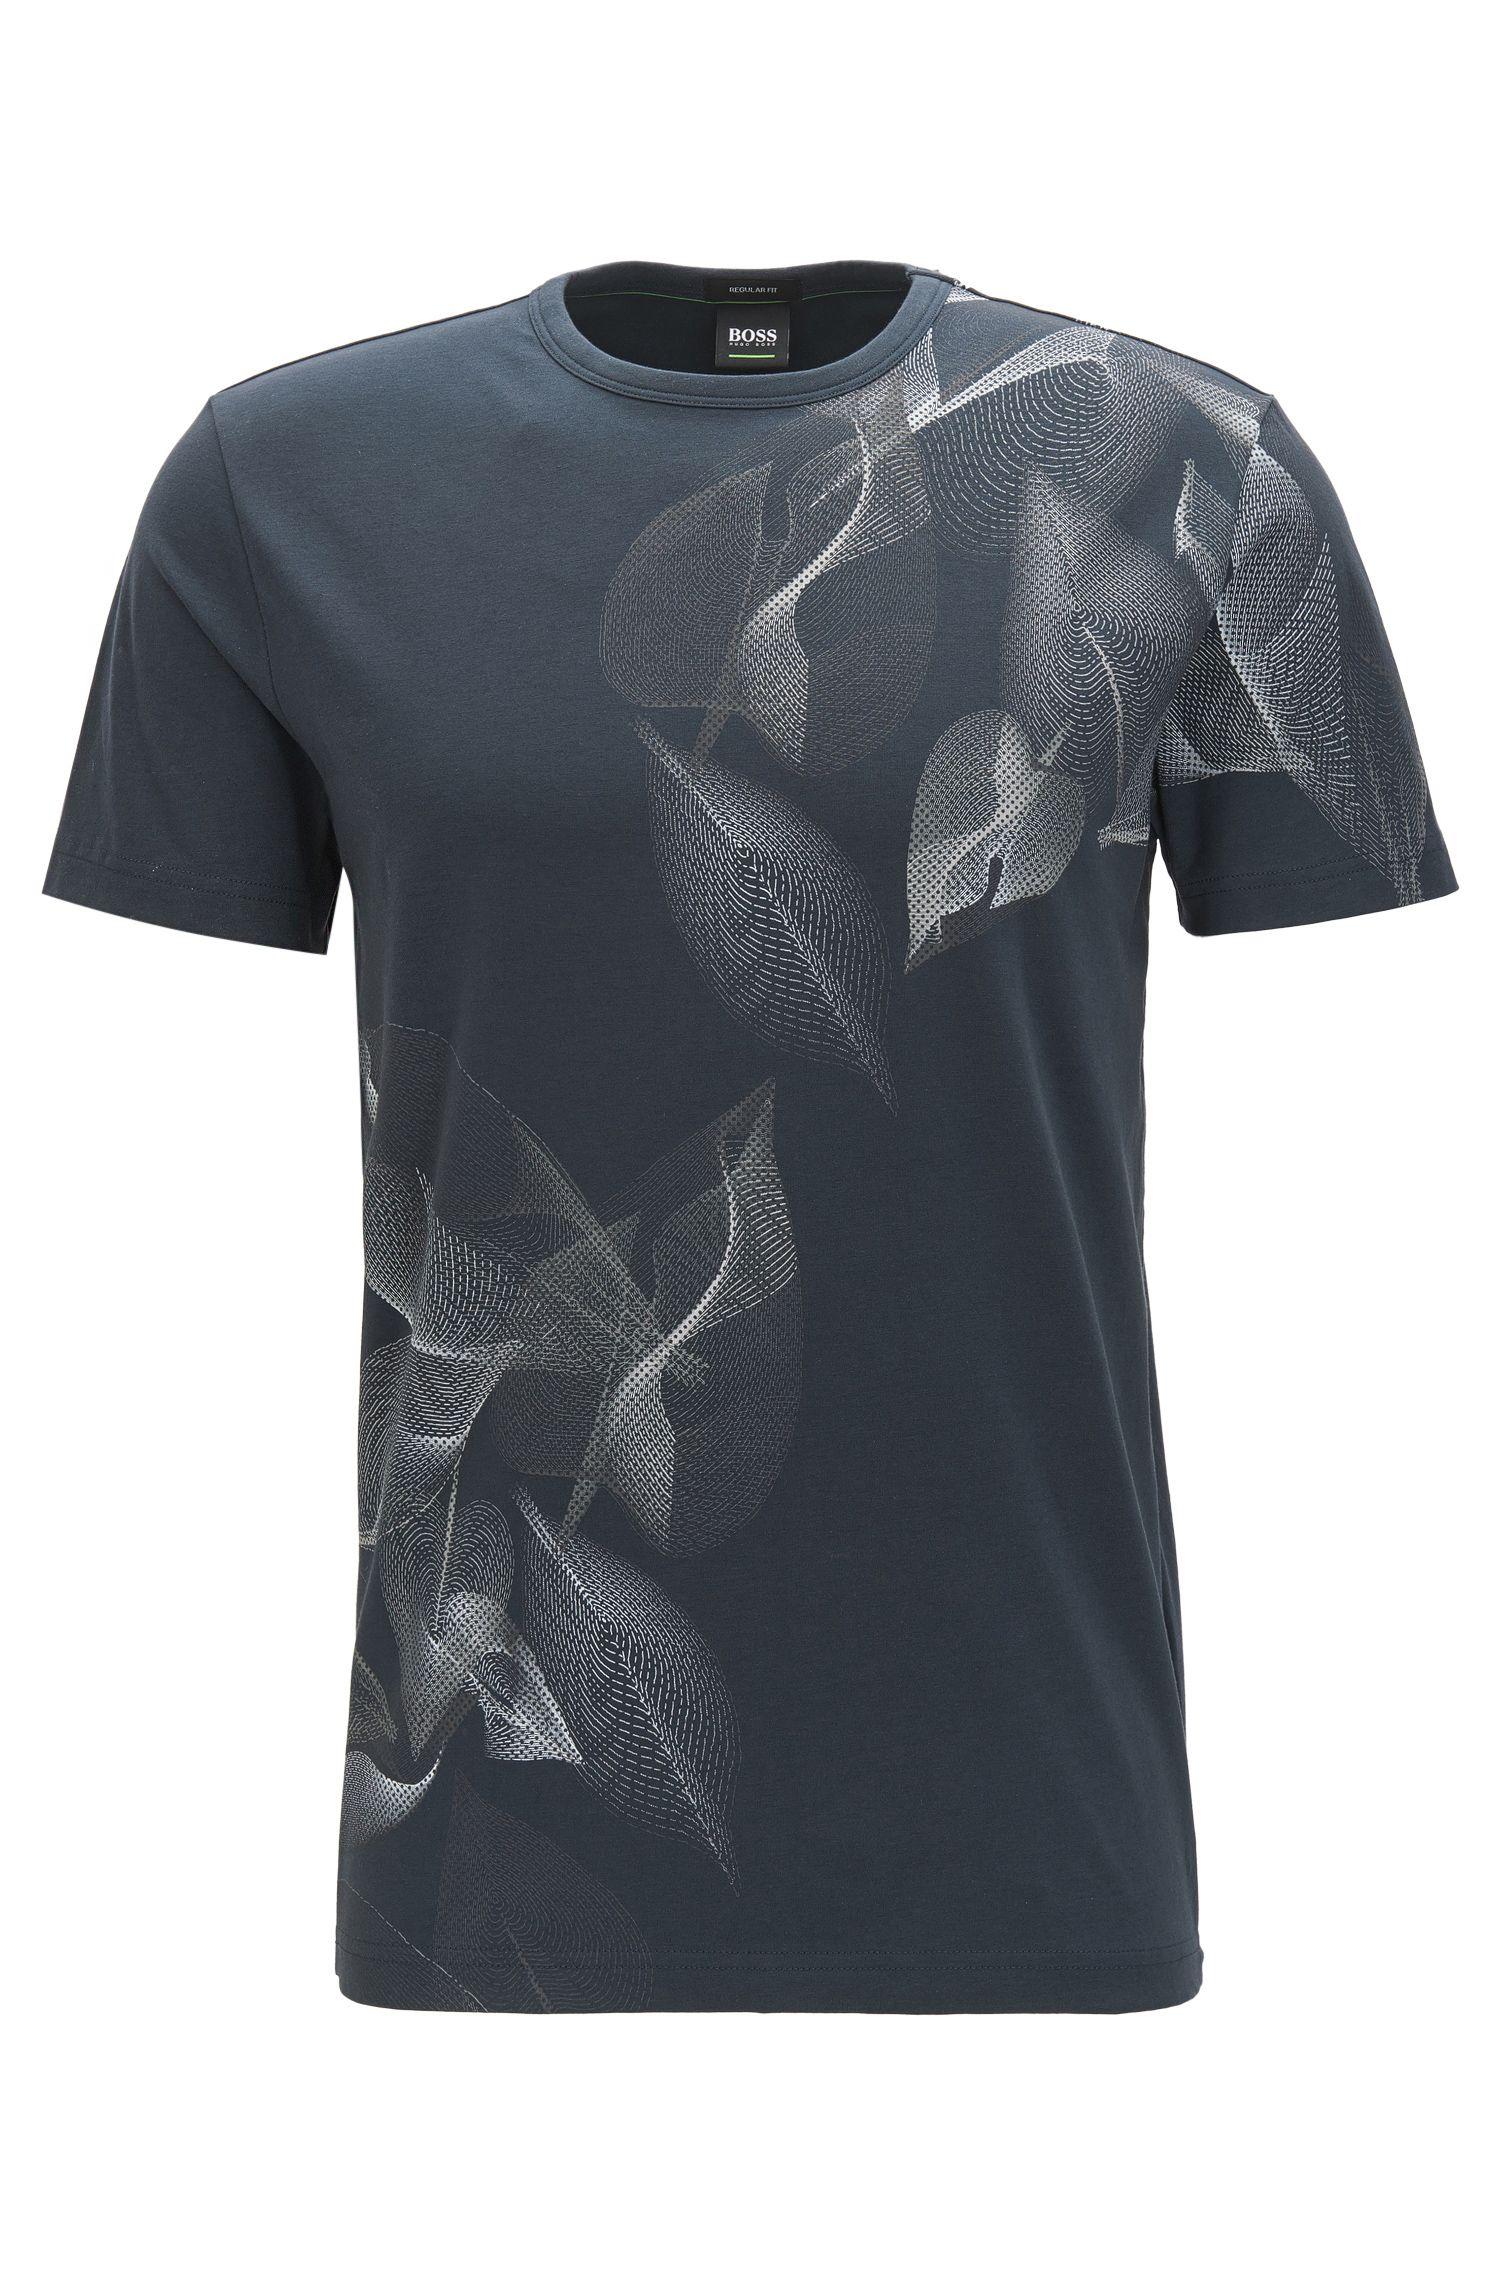 Bedrucktes Regular-Fit T-Shirt aus Stretch-Baumwolle